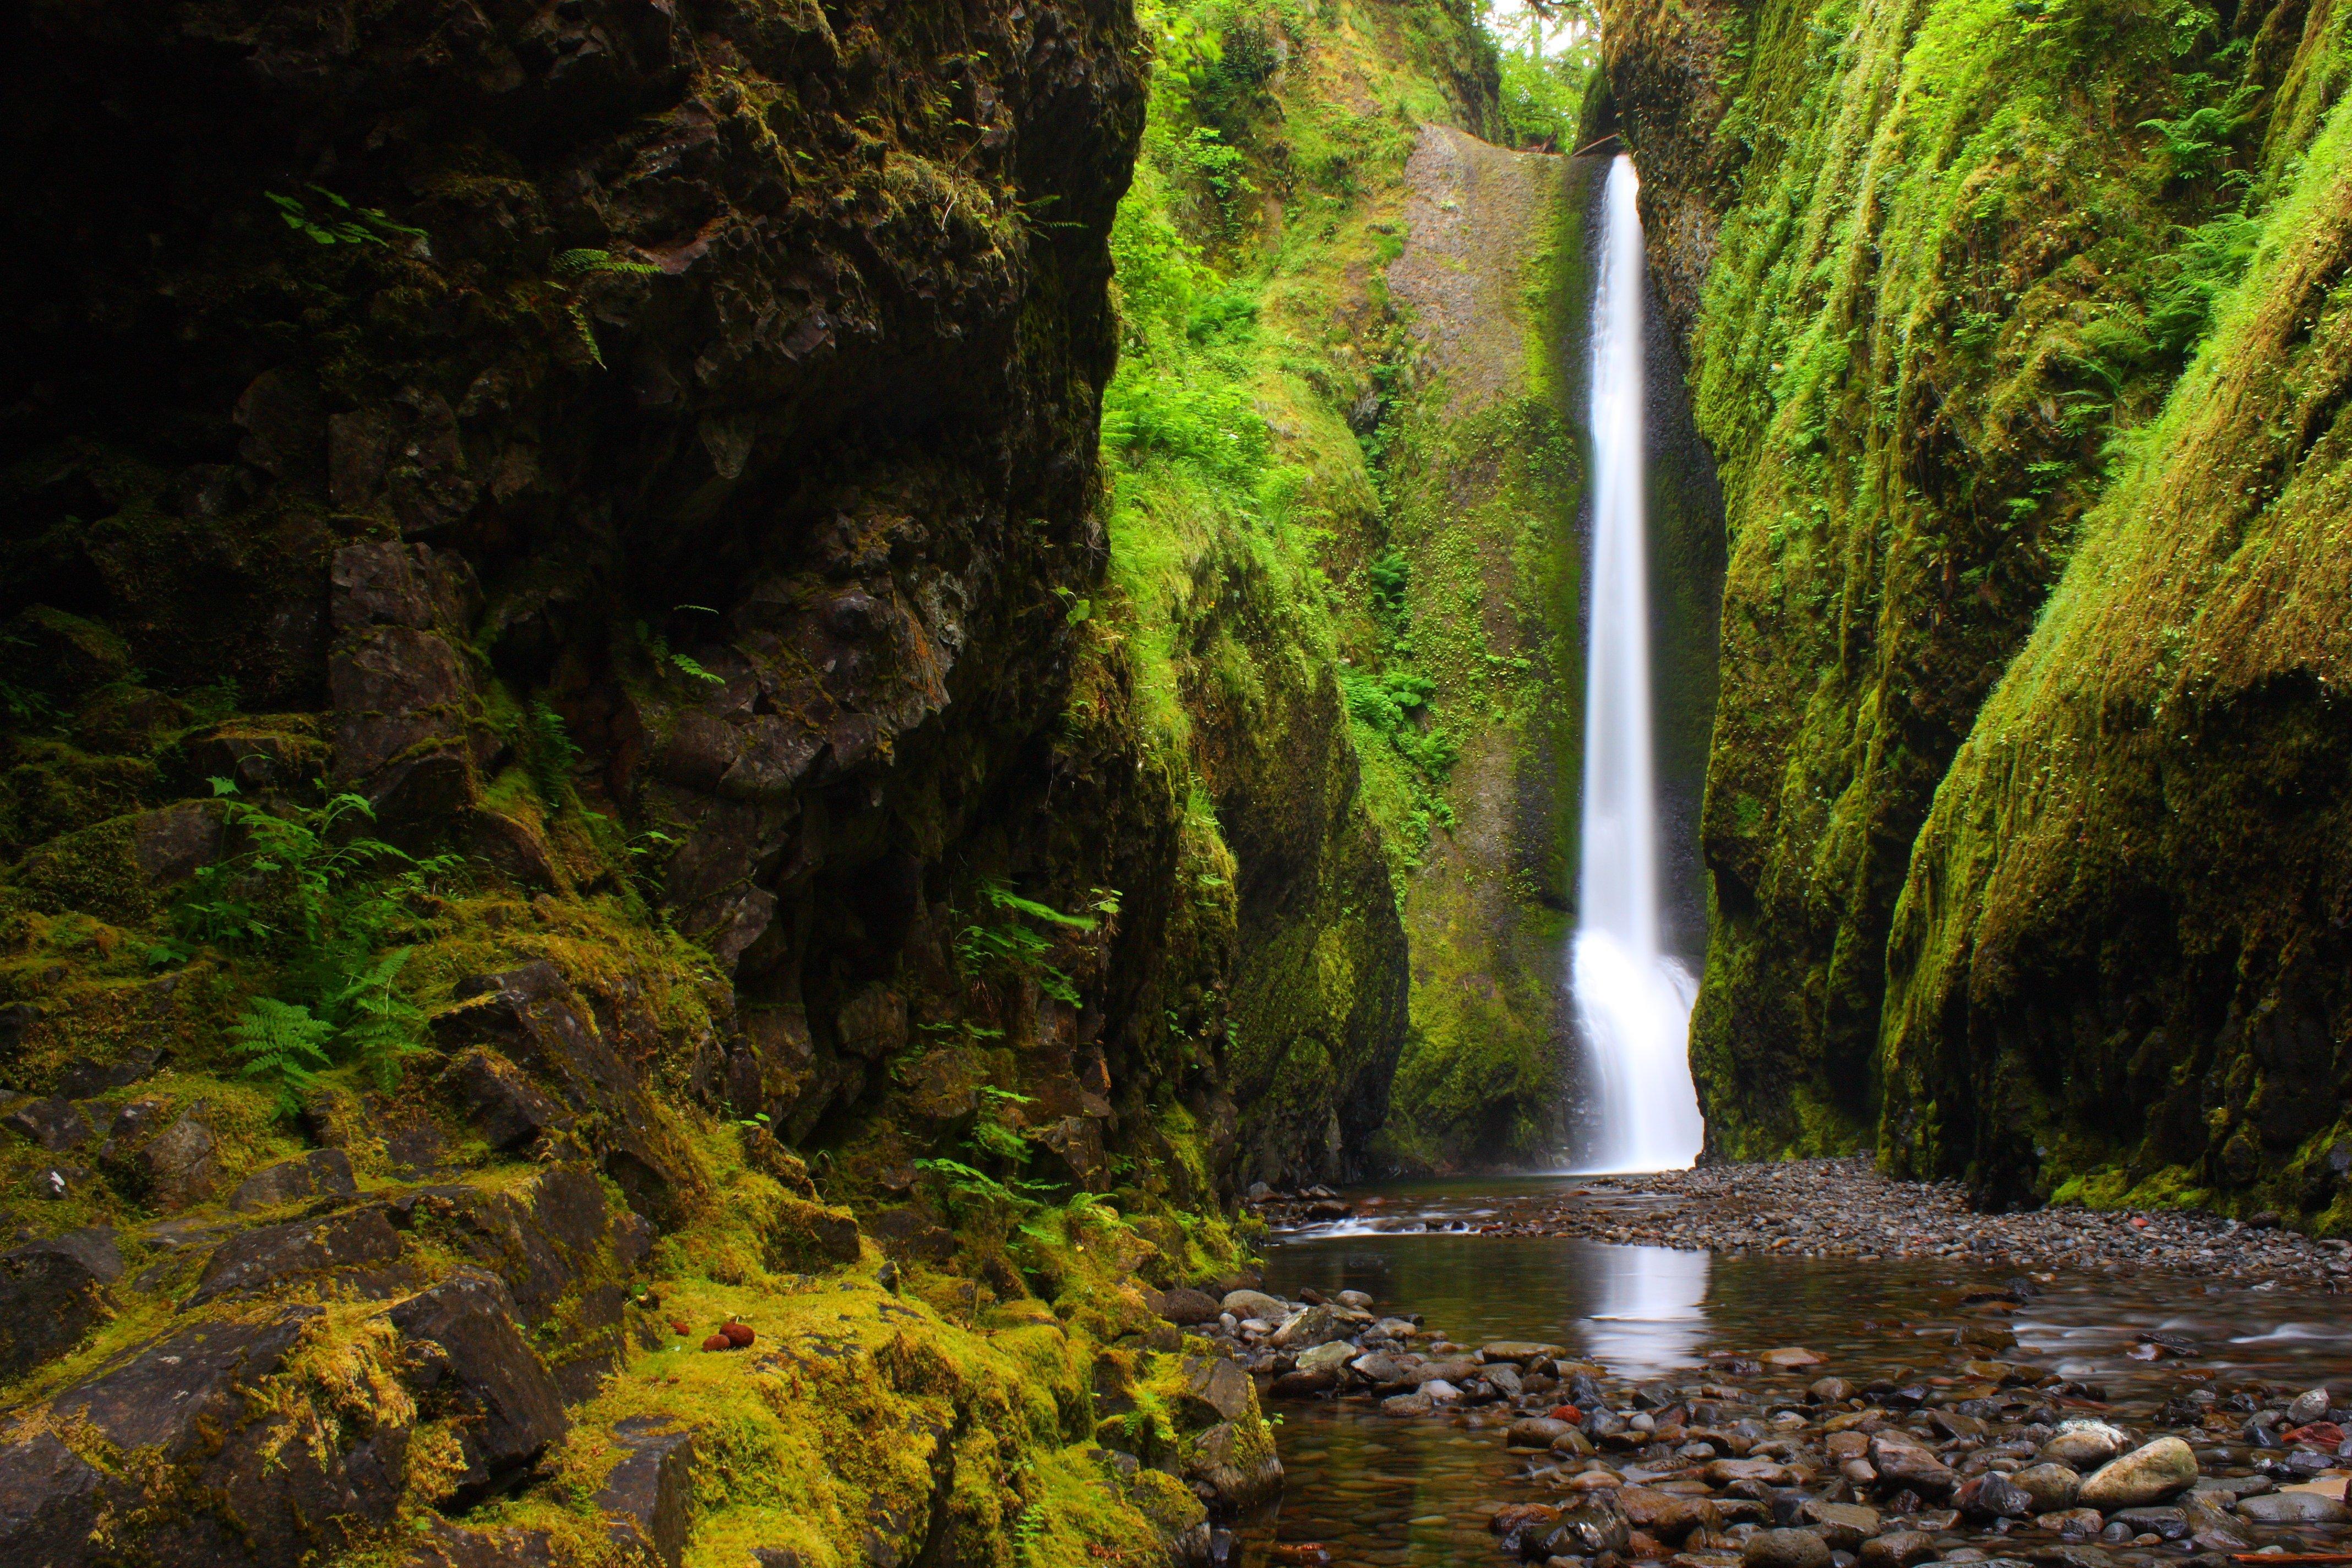 River mountains forest nature river gorge oregon wallpaper - Oregon nature wallpaper ...